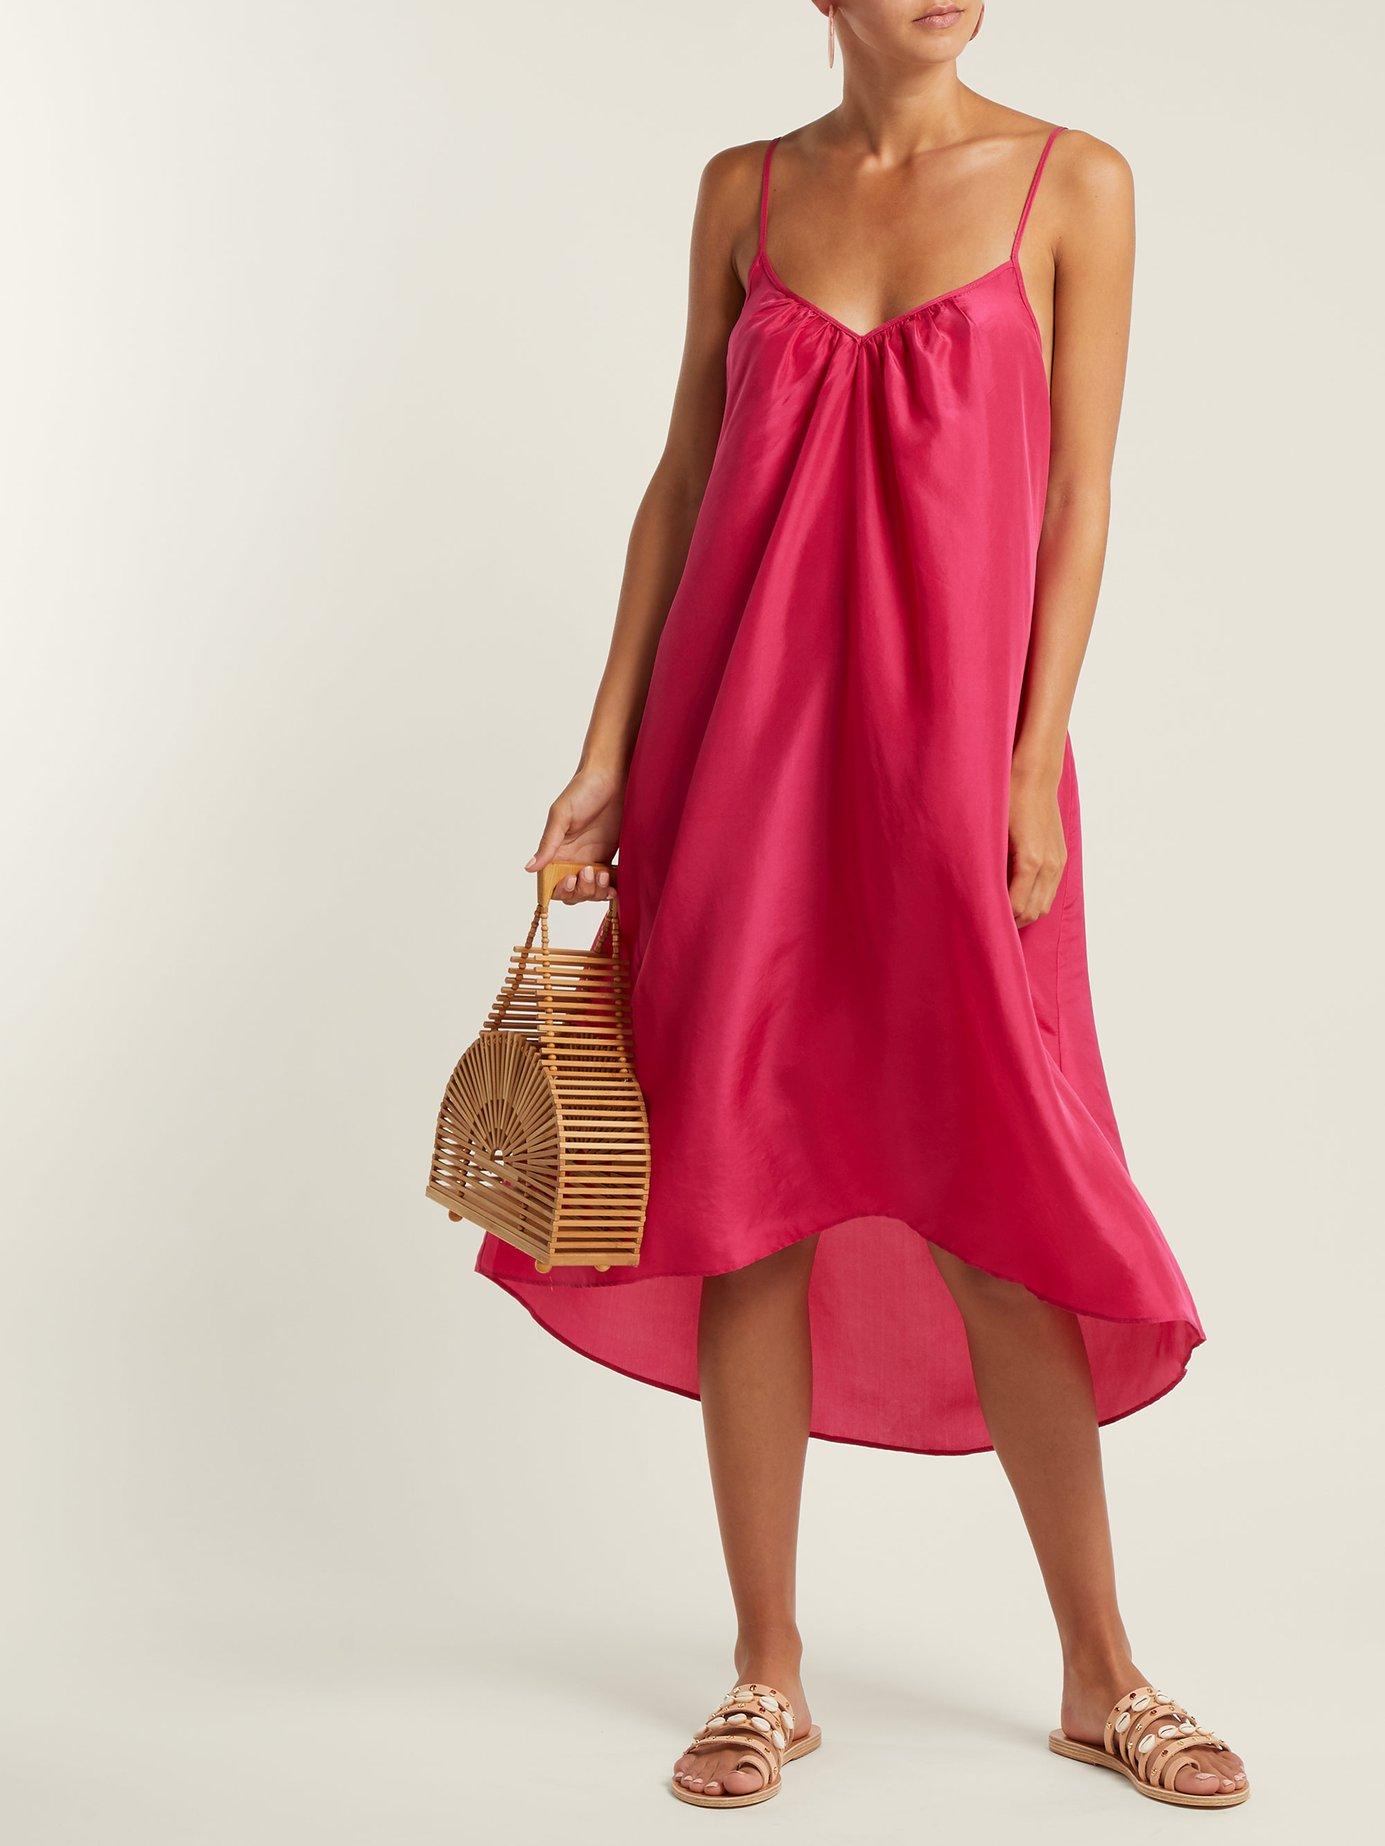 Cross-back silk-satin slip dress by Loup Charmant